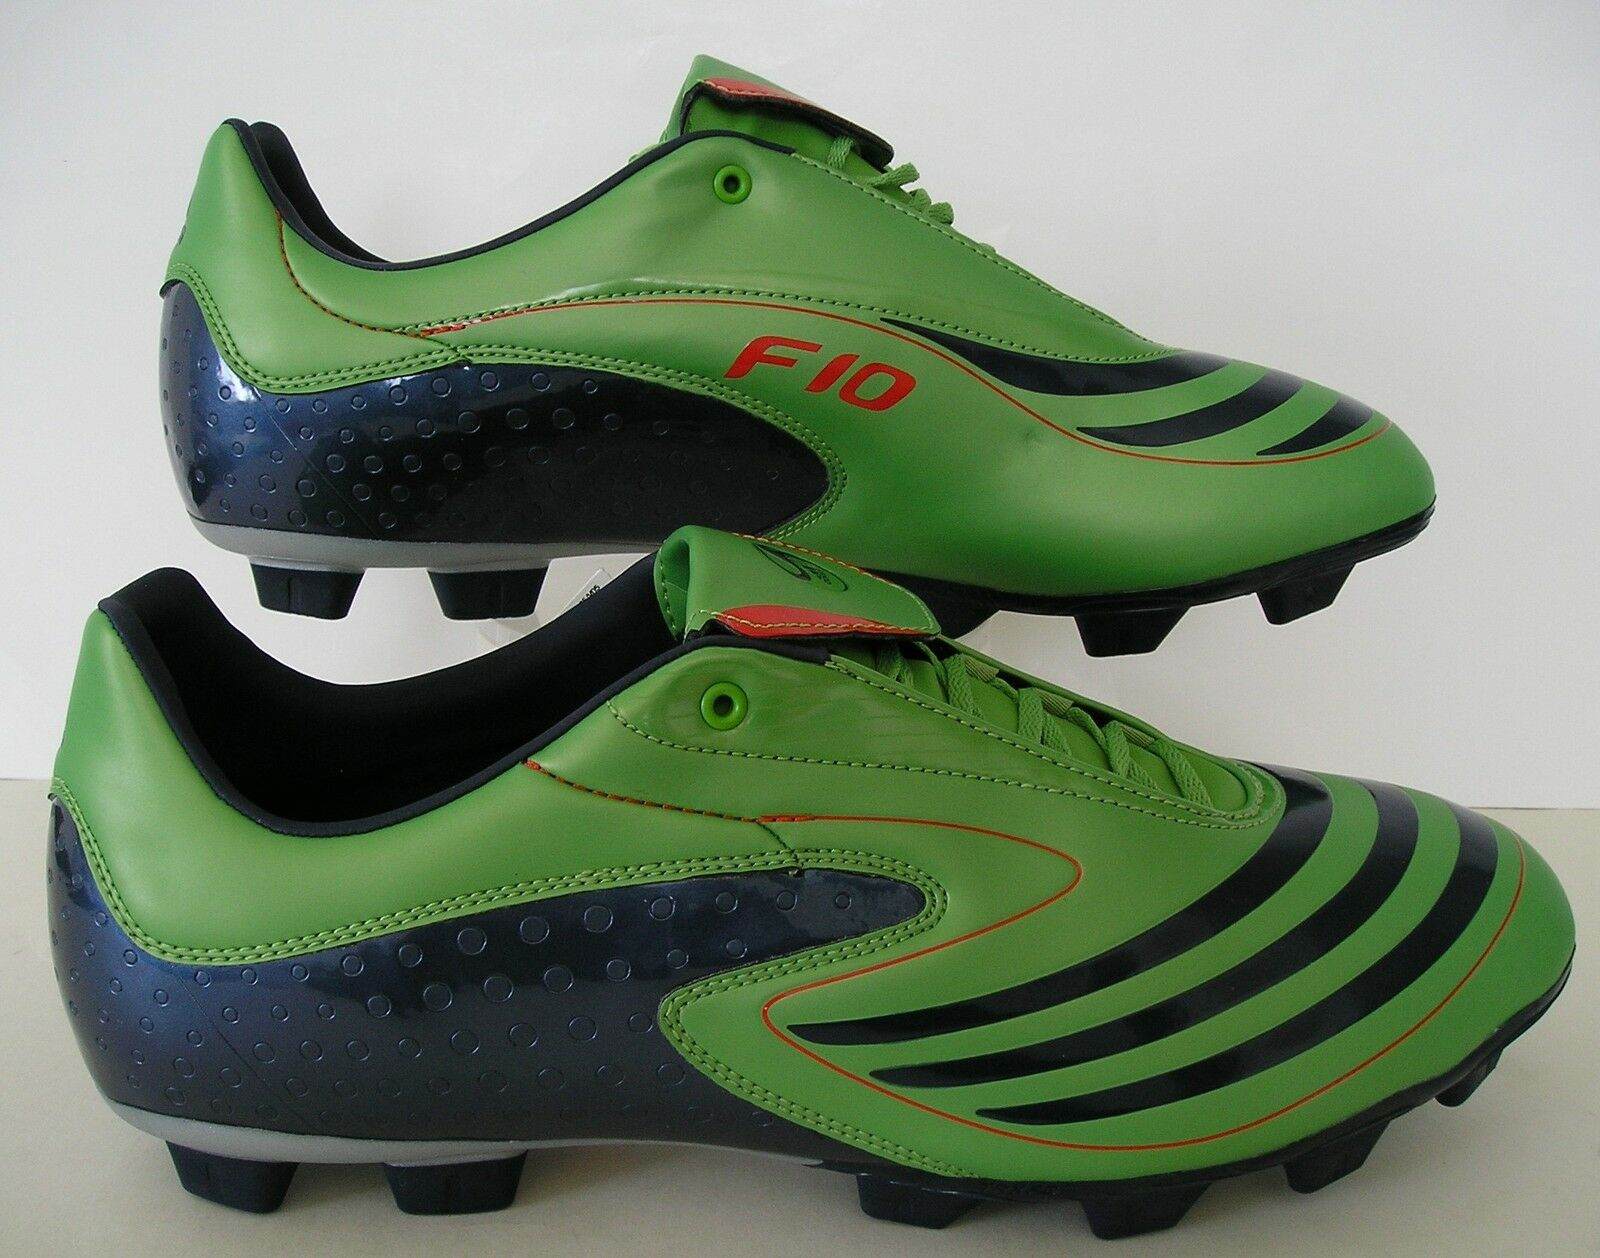 Nuevo  Adidas F10.8 TRX FG Fútbol Botines botas Zapato de F10 f30 F 10  Hombre Talla 12